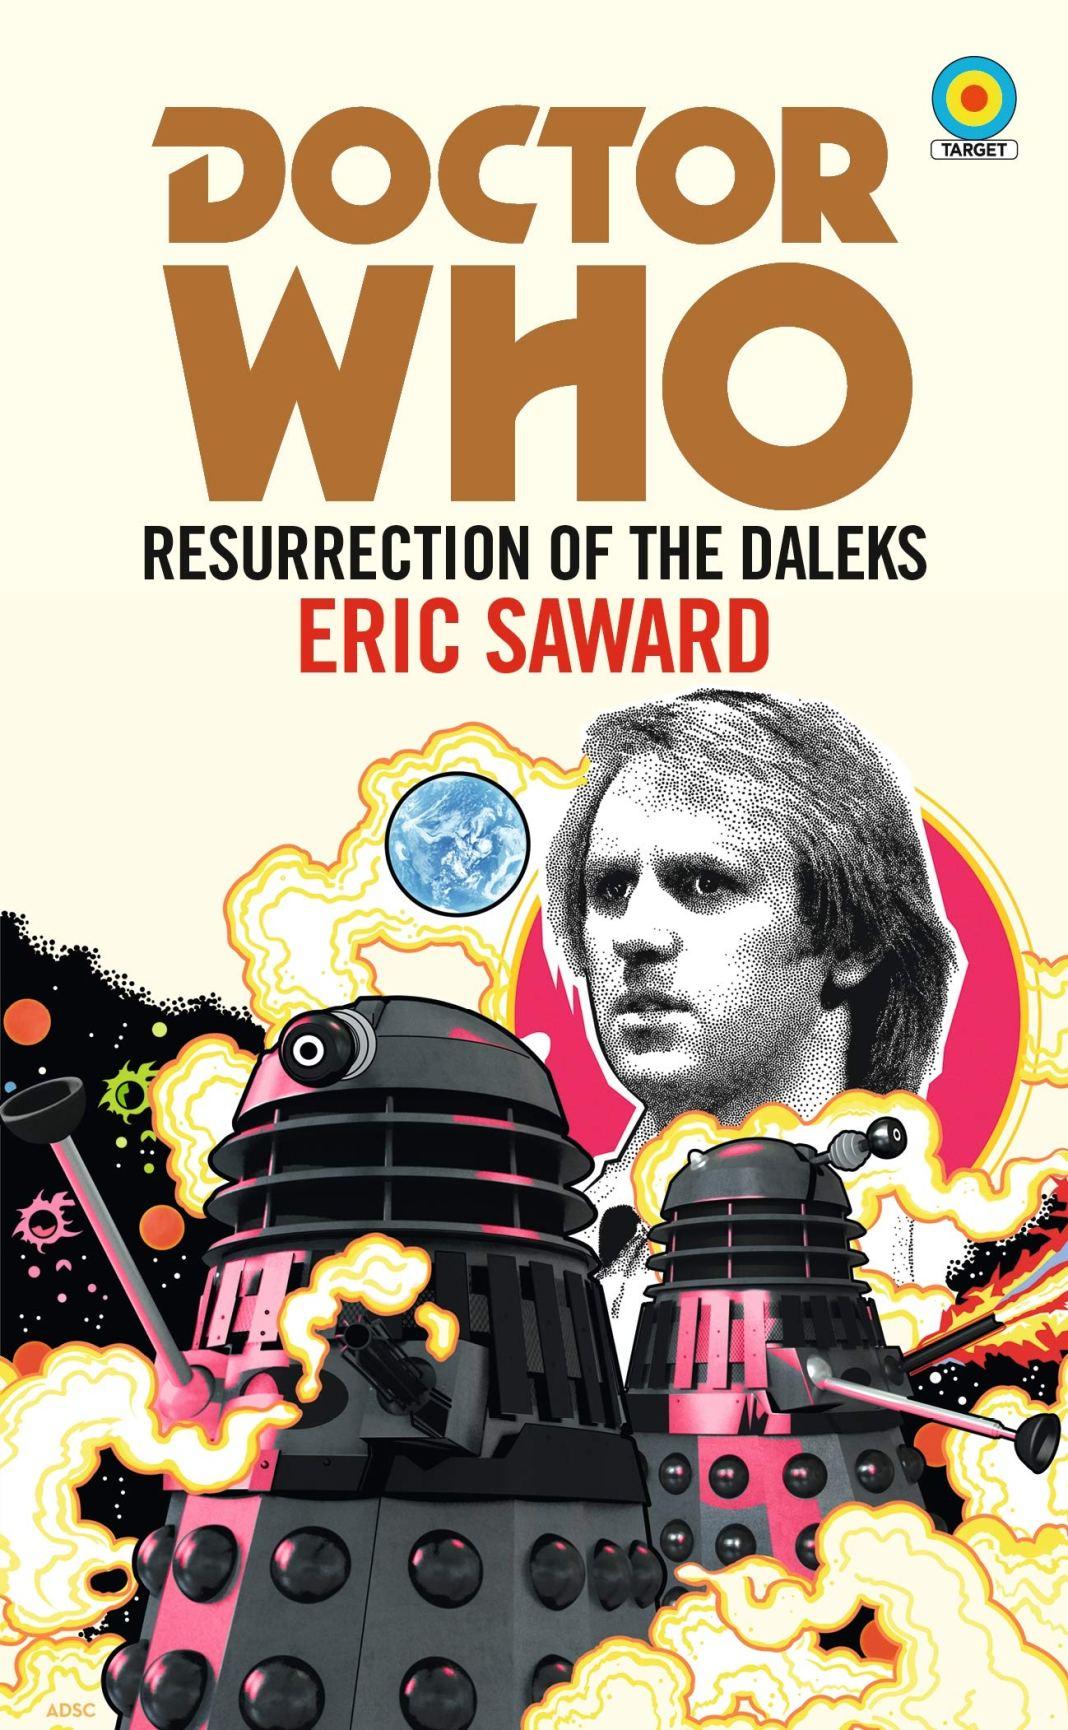 BBC Books - Resurrection of the Daleks by Eric Saward - Target Novelisation (Cover) Anthony Dry Fifth Doctor